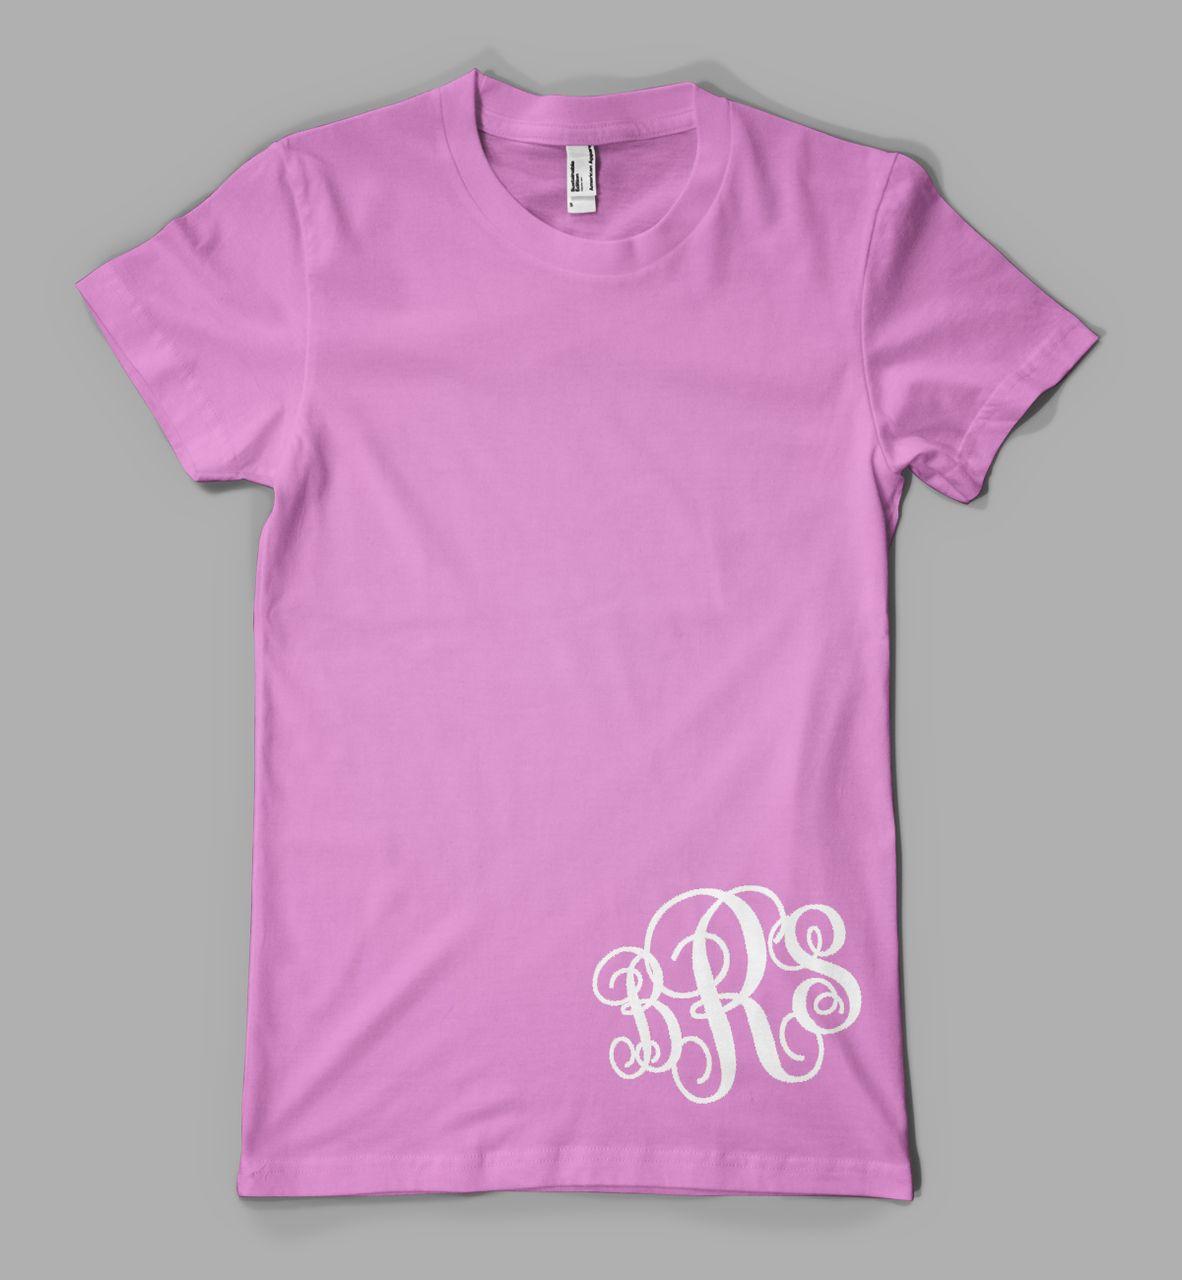 Design your own t-shirt decals - Custom Monogram T Shirt Ladies Monogrammed Initials Personalized T Shirt Bottom Print